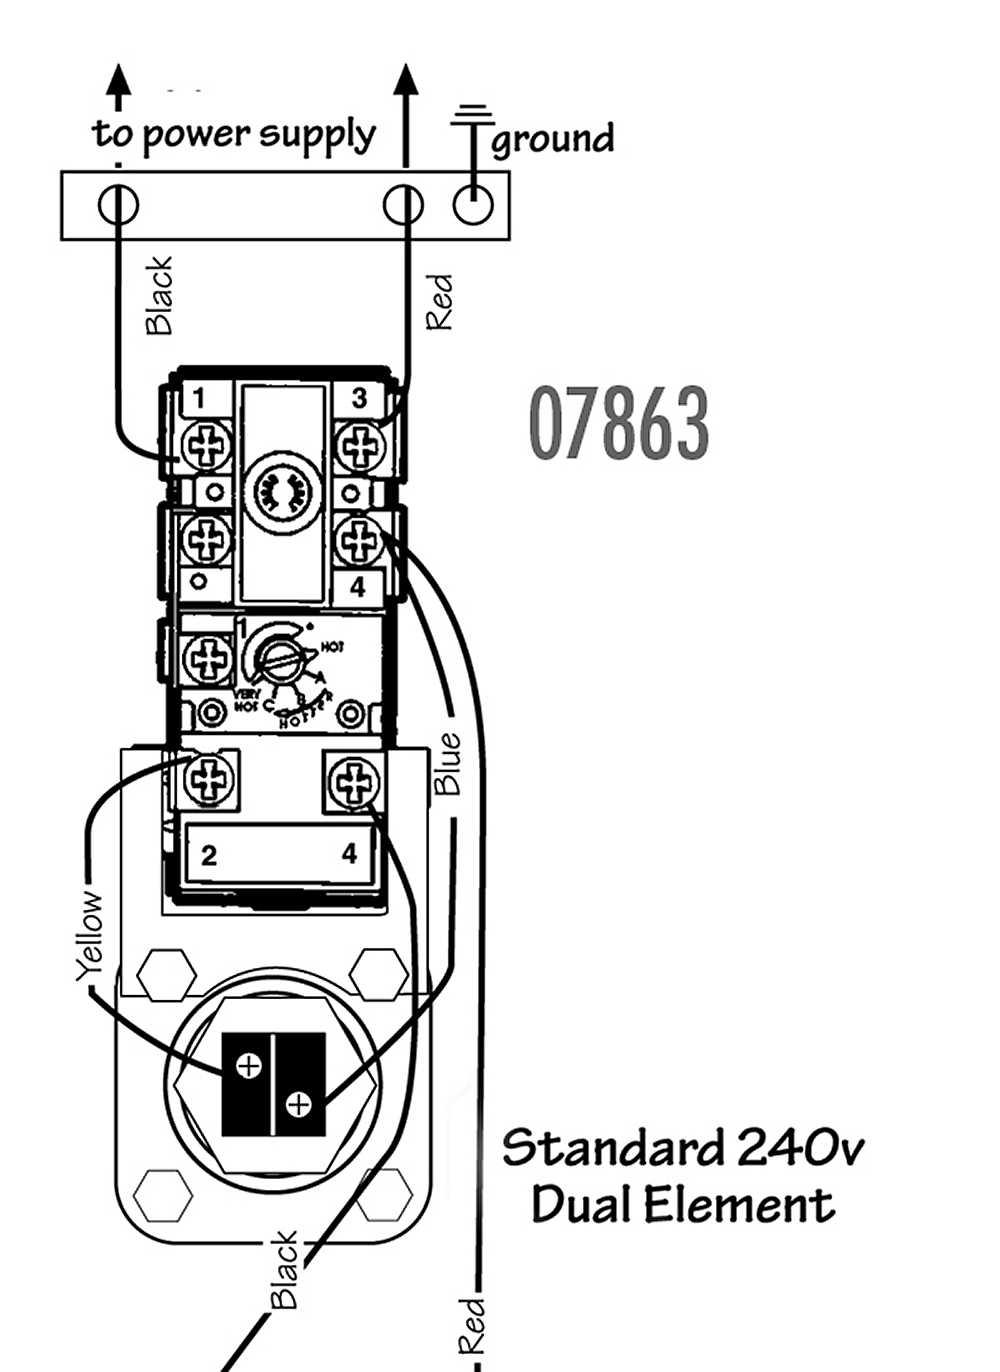 dual element 240 volt hot water heater wiring